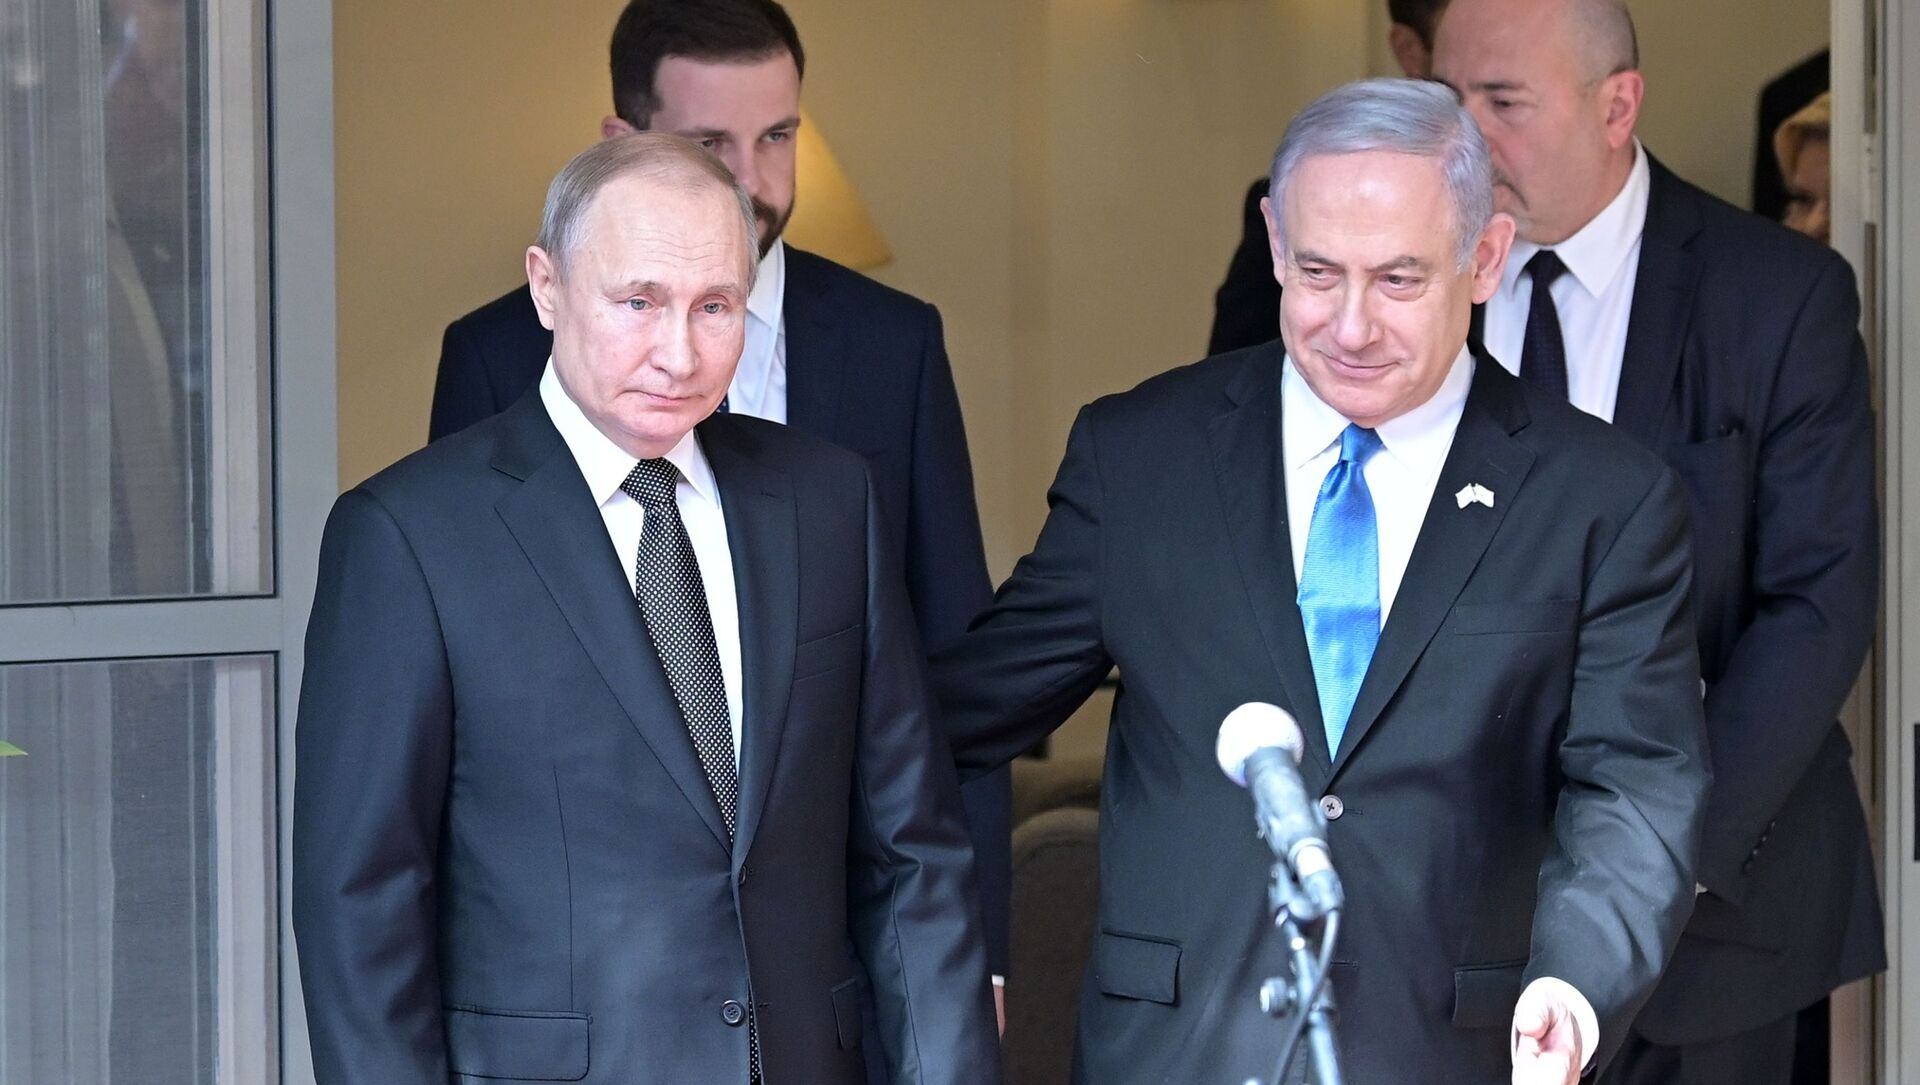 Ruský prezident Vladimir Putin a izraelský premiér Benjamin Netanjahu v Tel Avivu - Sputnik Česká republika, 1920, 19.02.2021